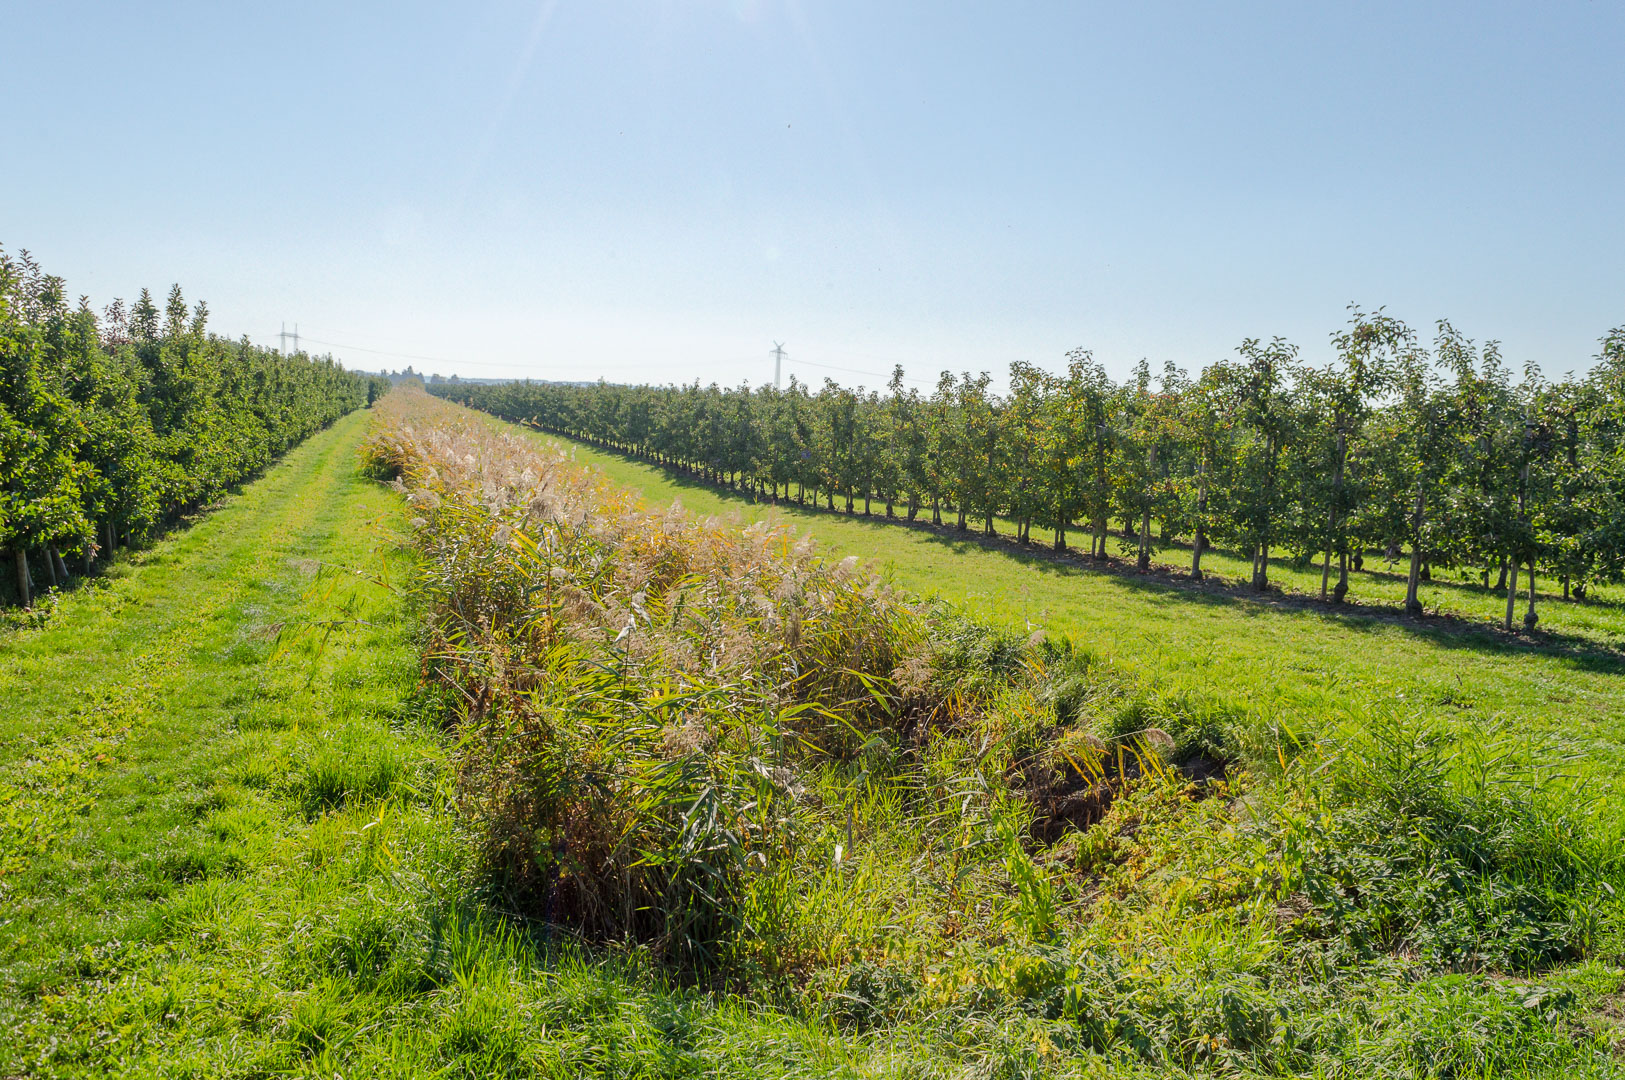 Altes-Land-Twielenfleth